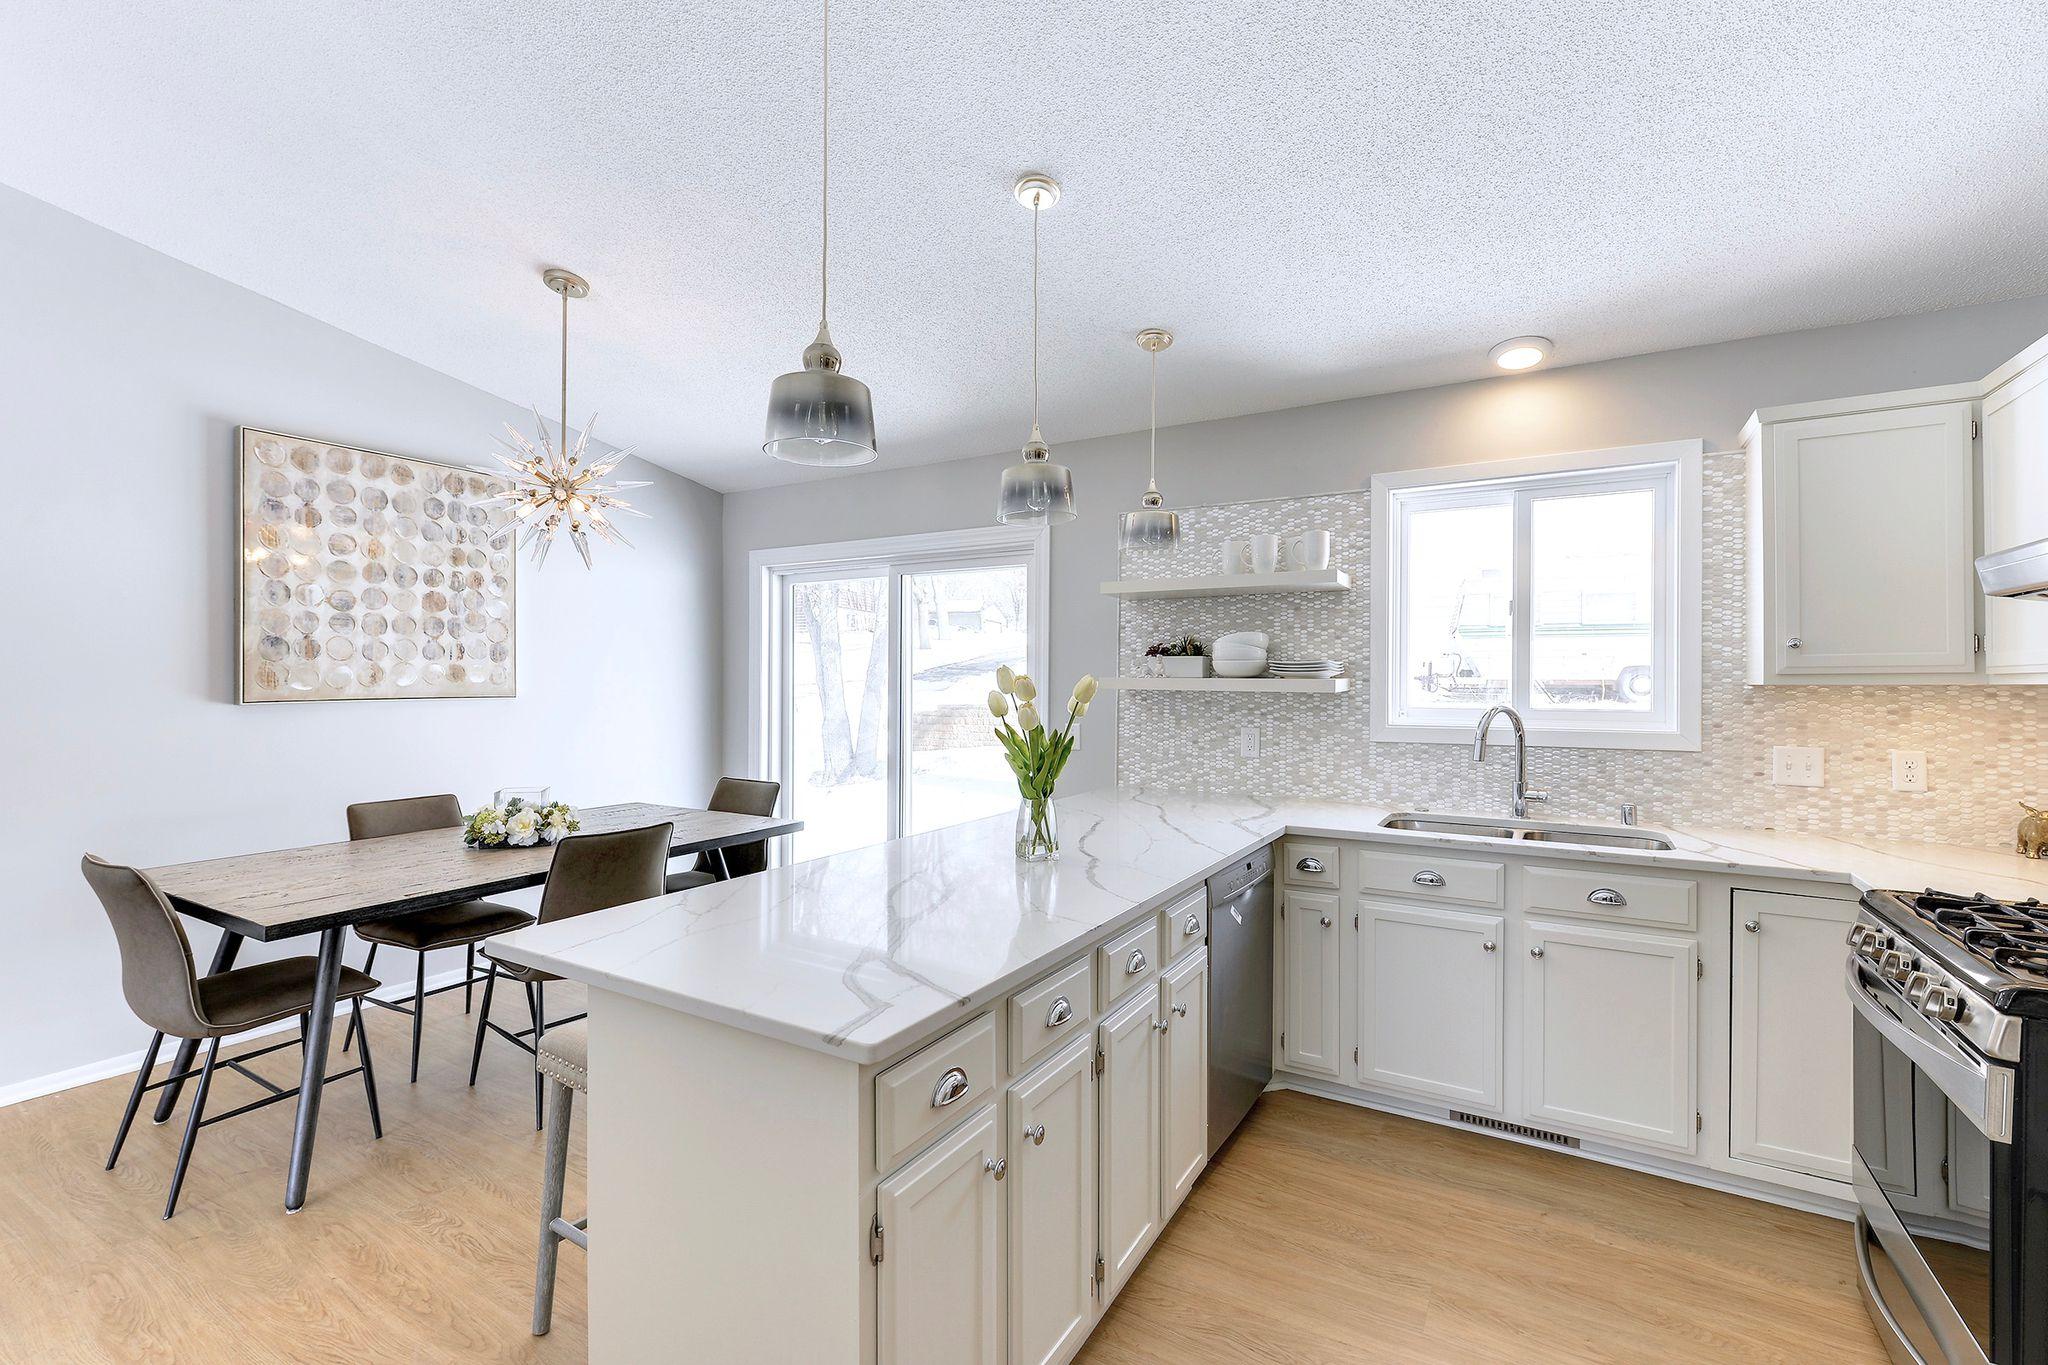 🏡 402 Glenmar Ave, Saint Paul, MN 55115 - Recently Sold | Trulia